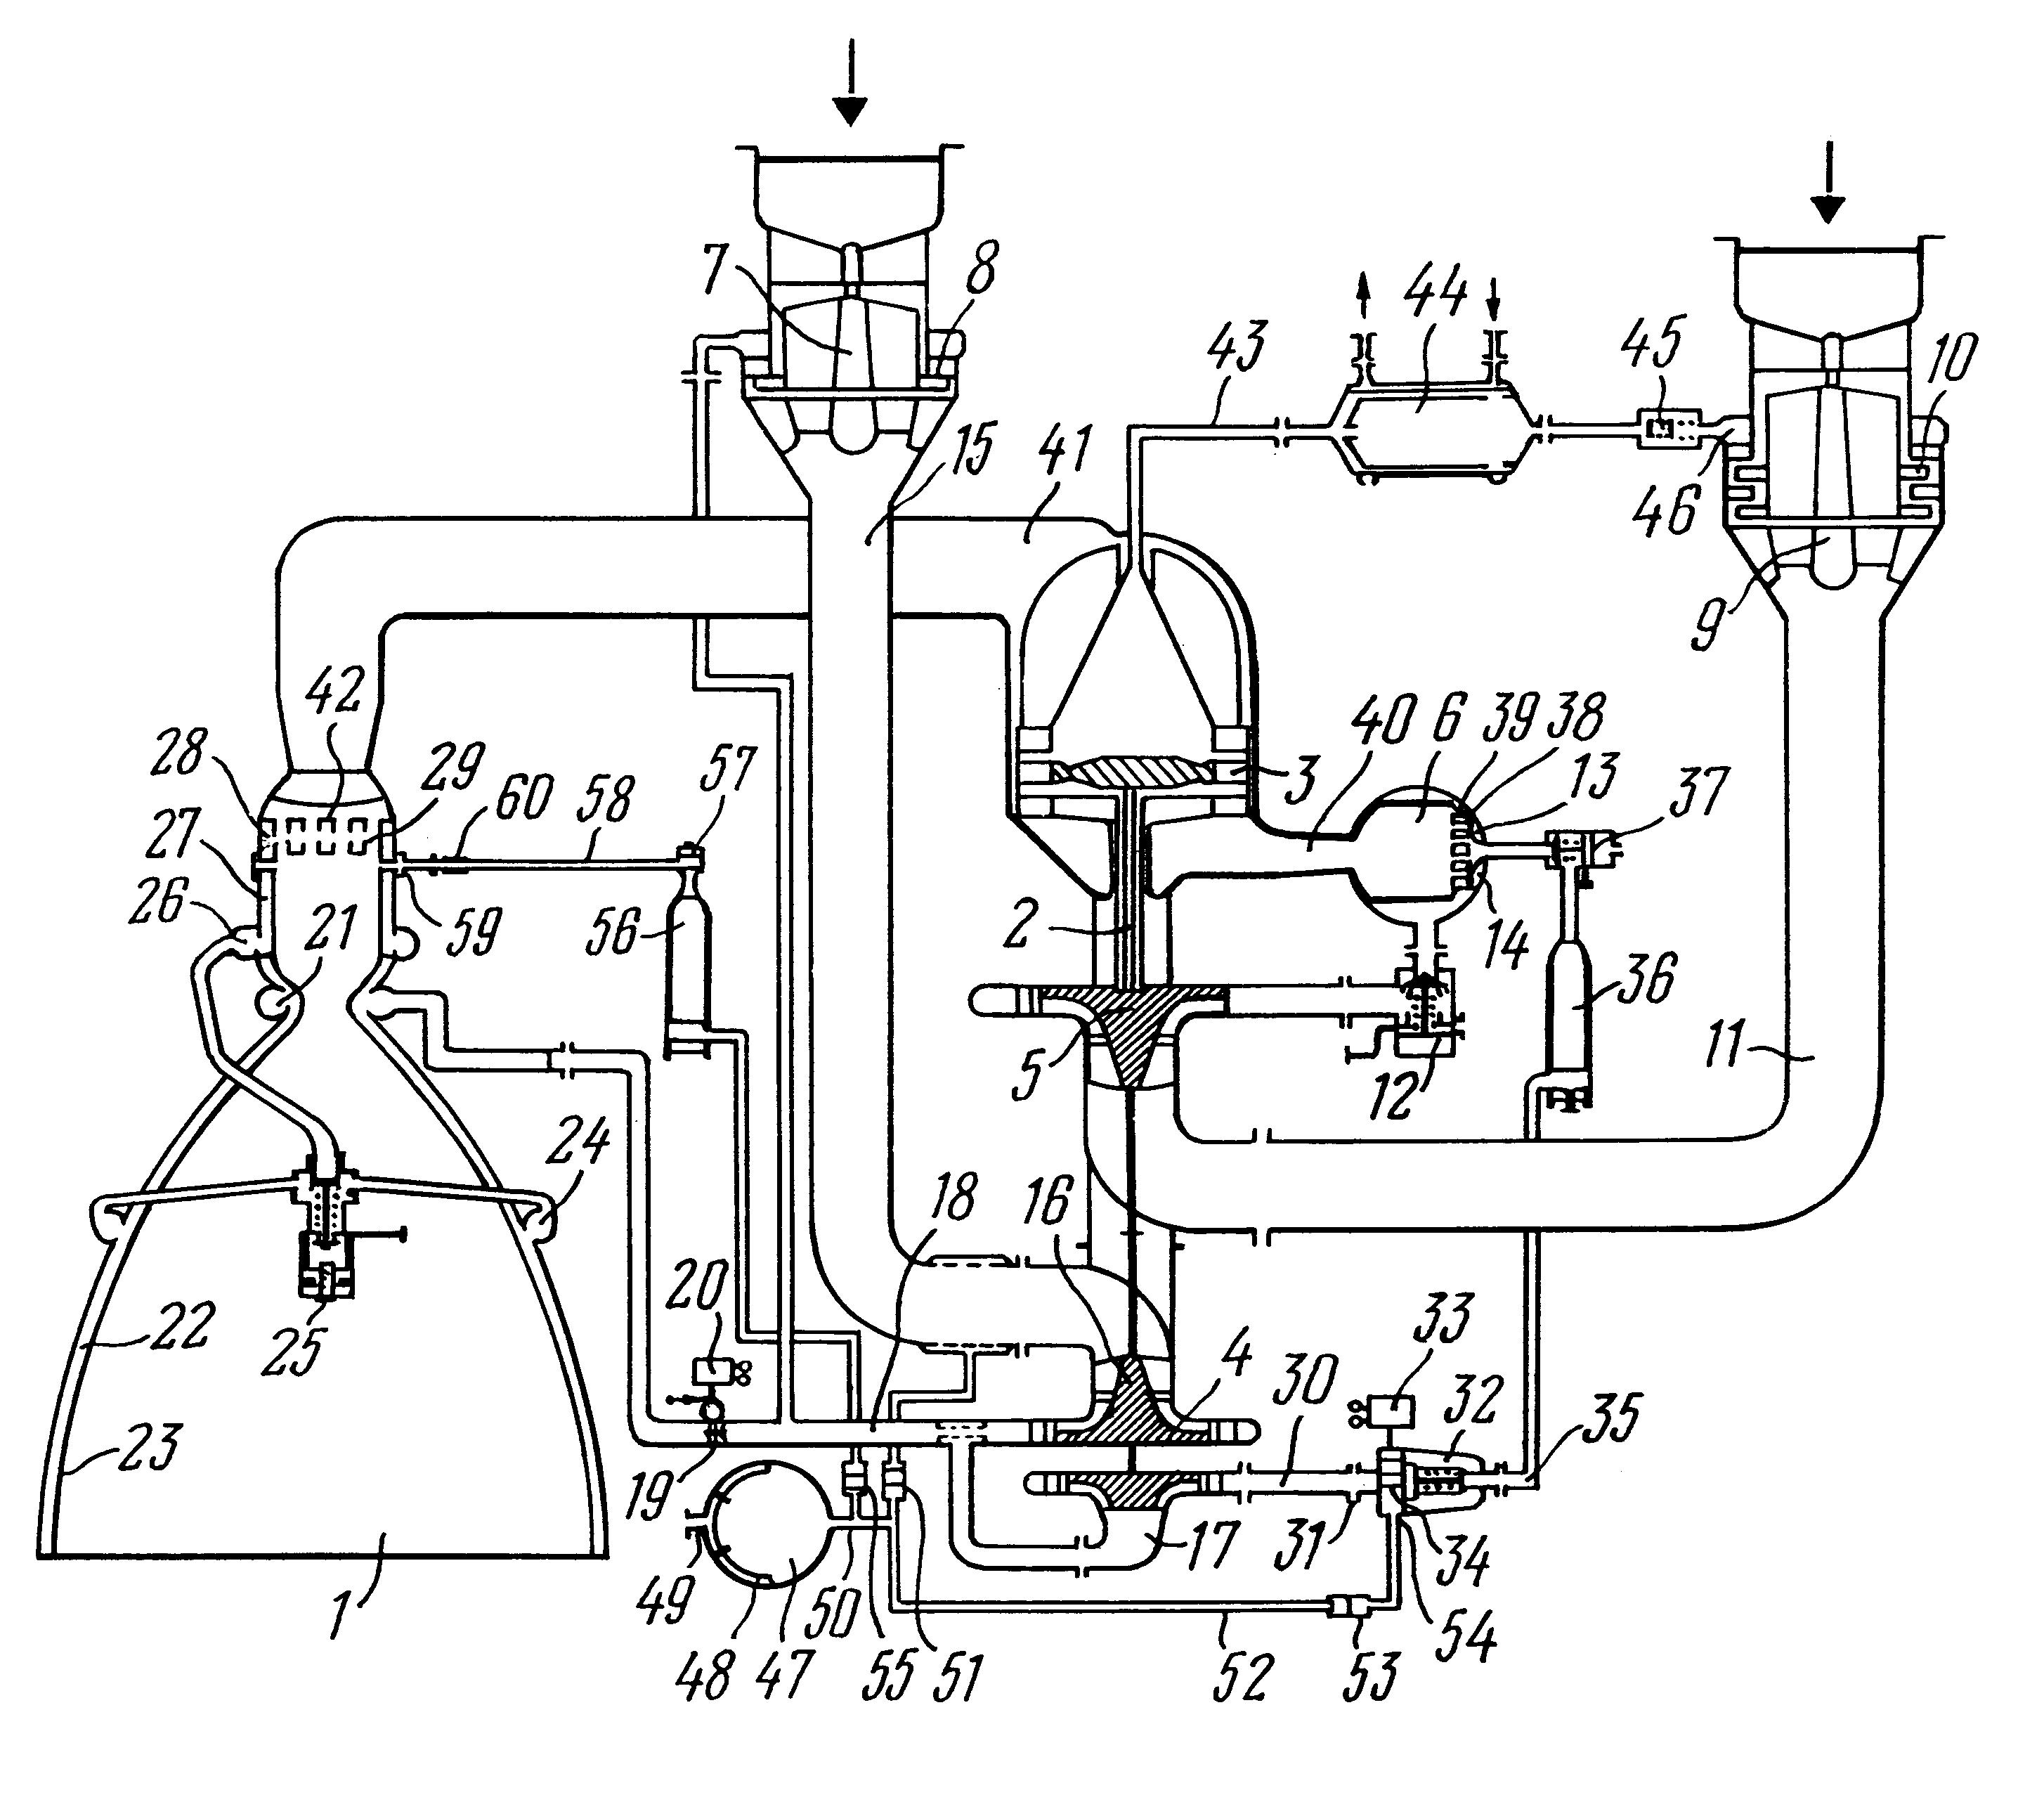 Patent US6226980 Liquidpropellant rocket engine with turbine – Diagram Of Rocket Engine